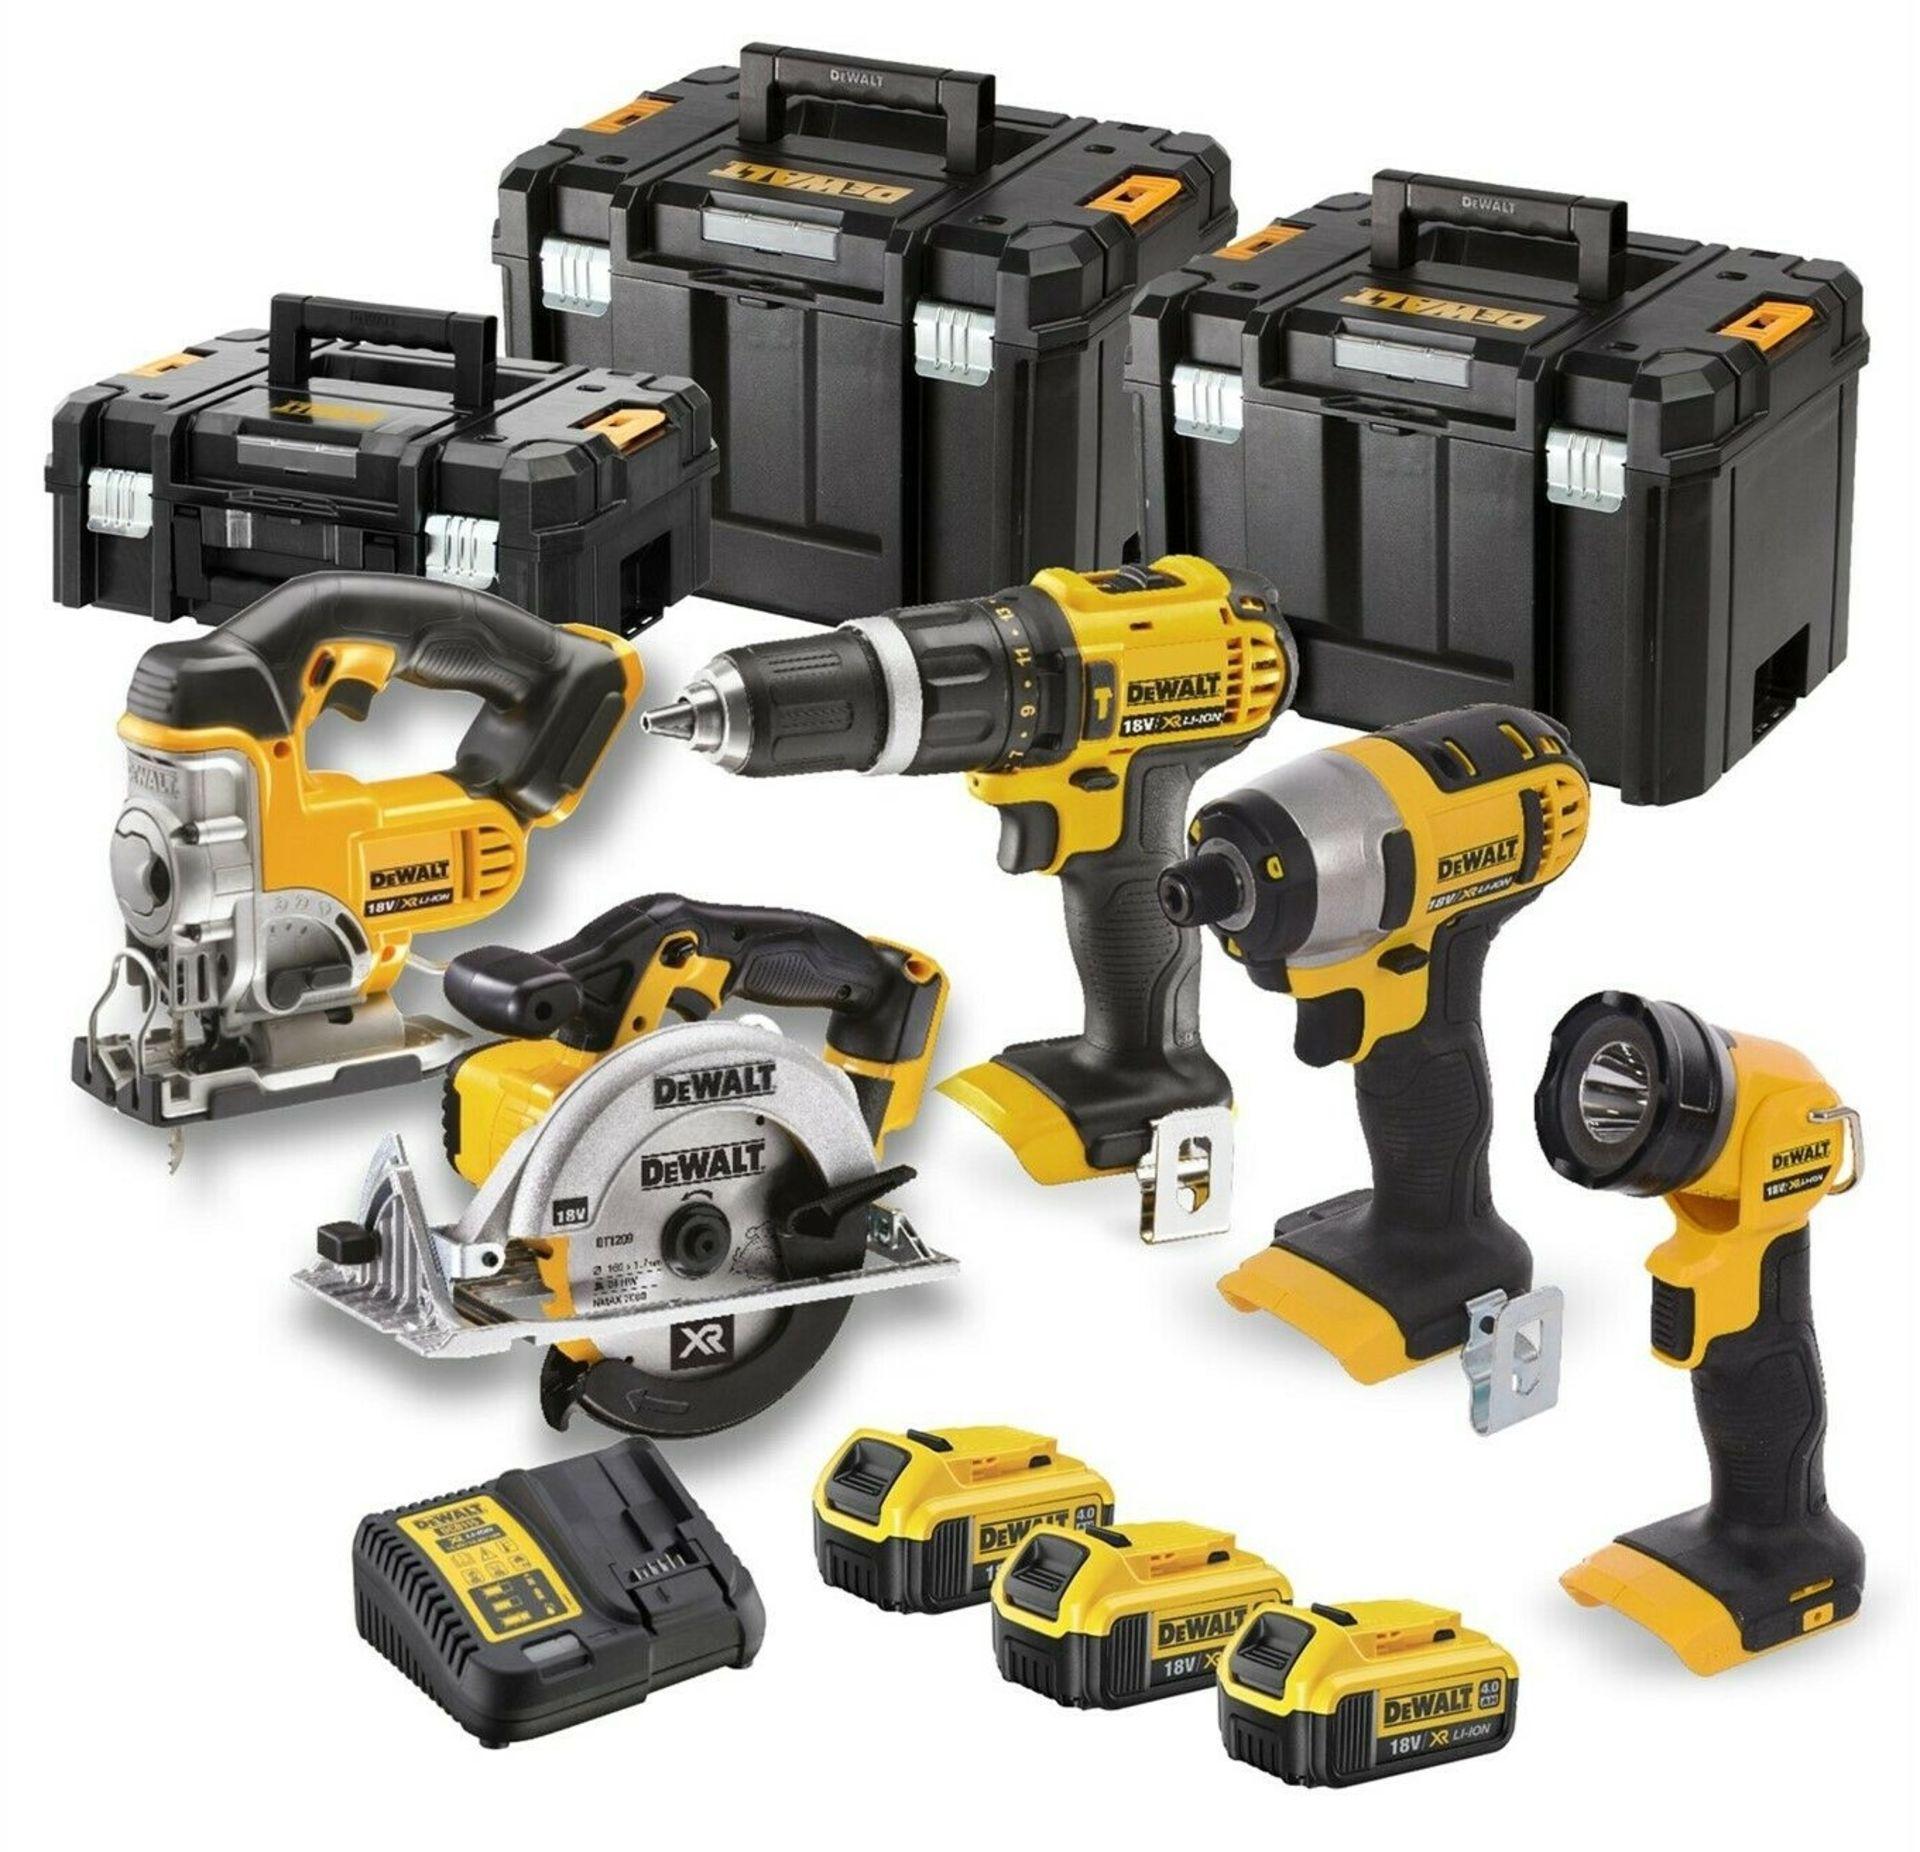 Lot 17013 - V Brand New DeWalt 18v 5 Piece Set Inc 3x 5.0Ah Batteries - Kit Includes Impact Driver + Combi Drill